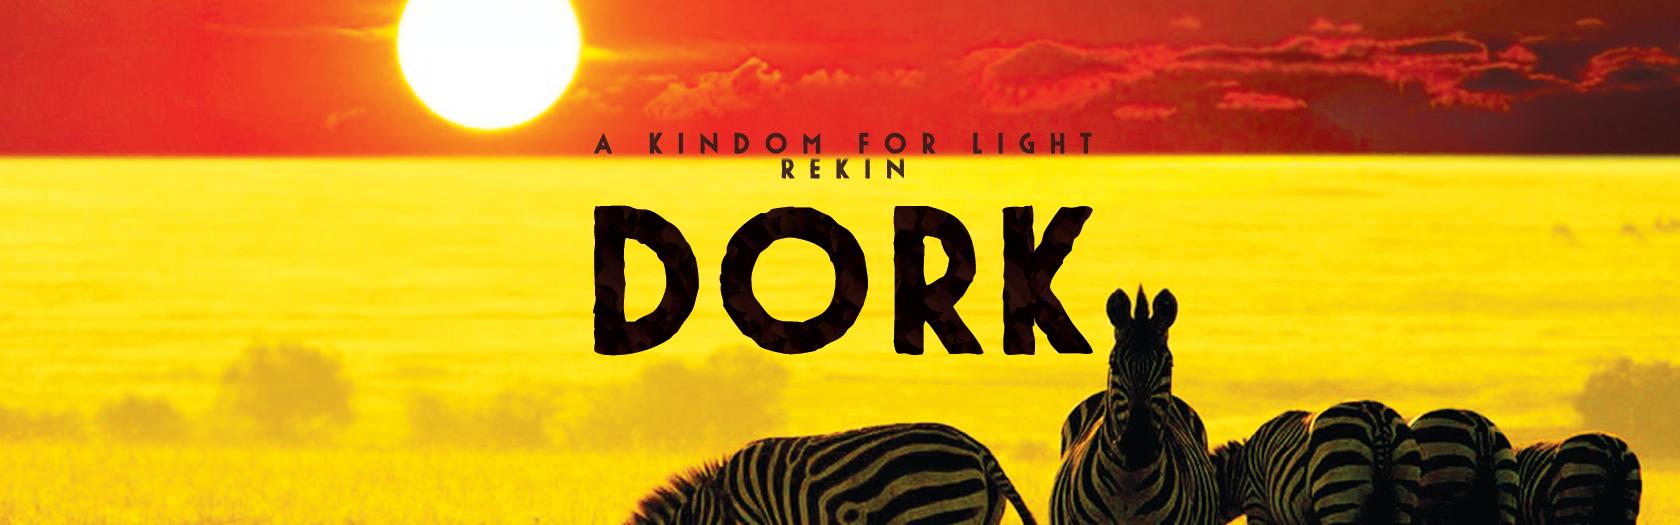 http://www.rekrecords.com/wp-content/uploads/2015/11/cover_dork.png